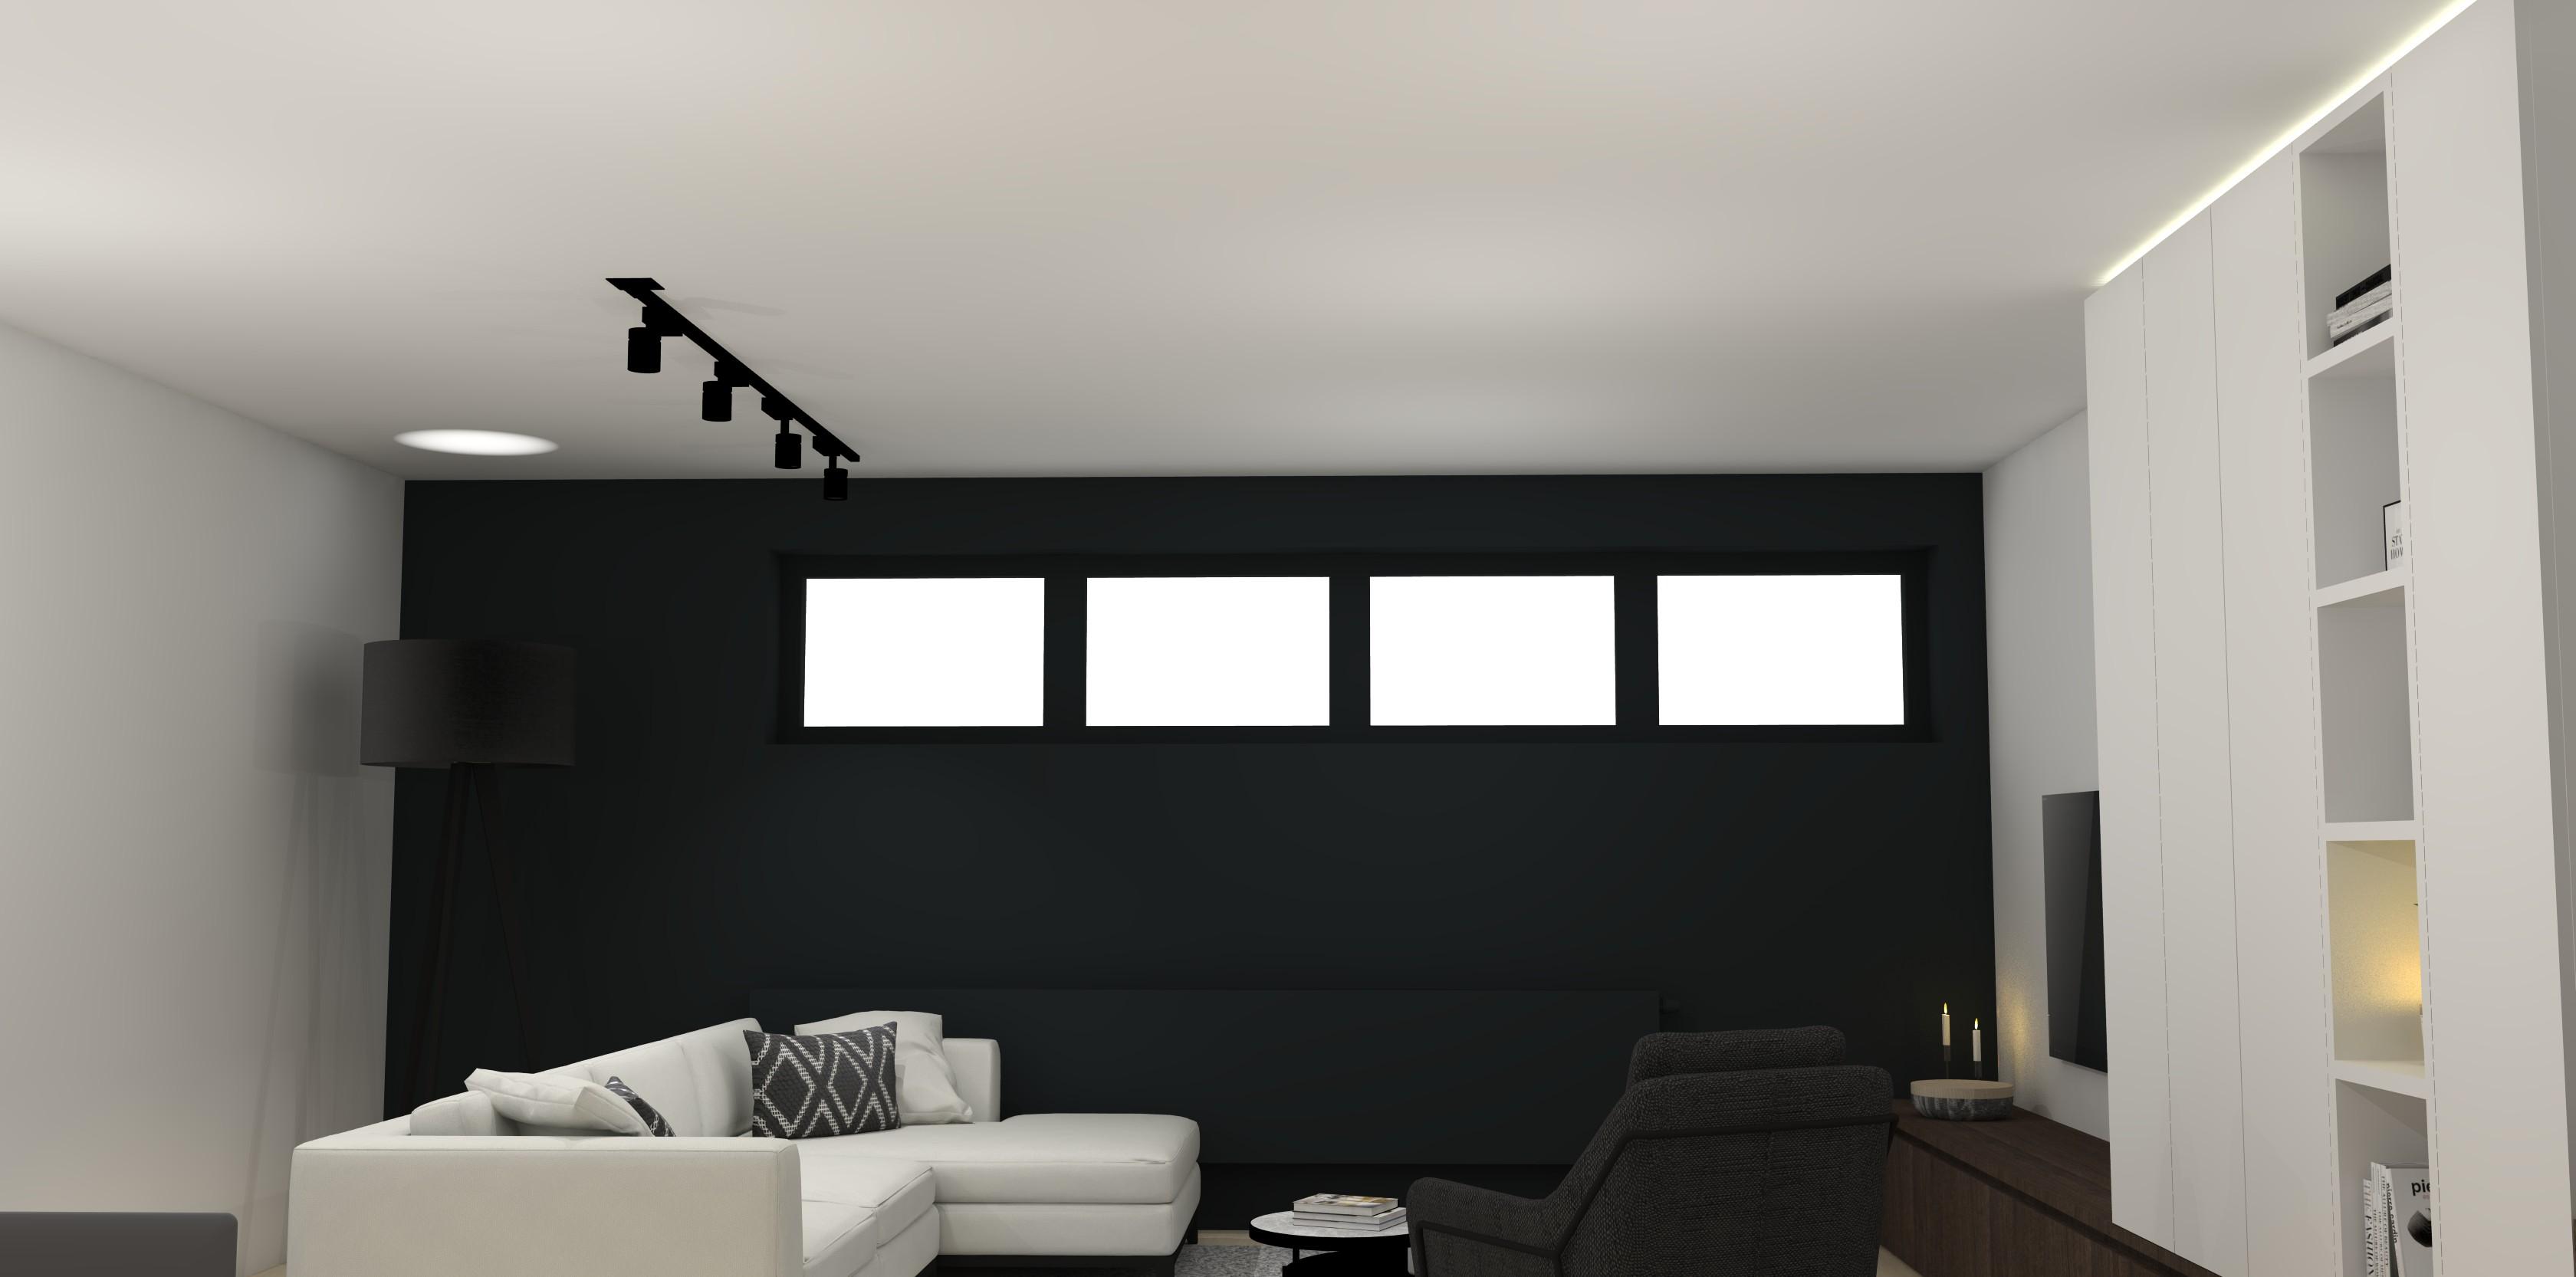 interieurarchitectuur renovatie woonkamer